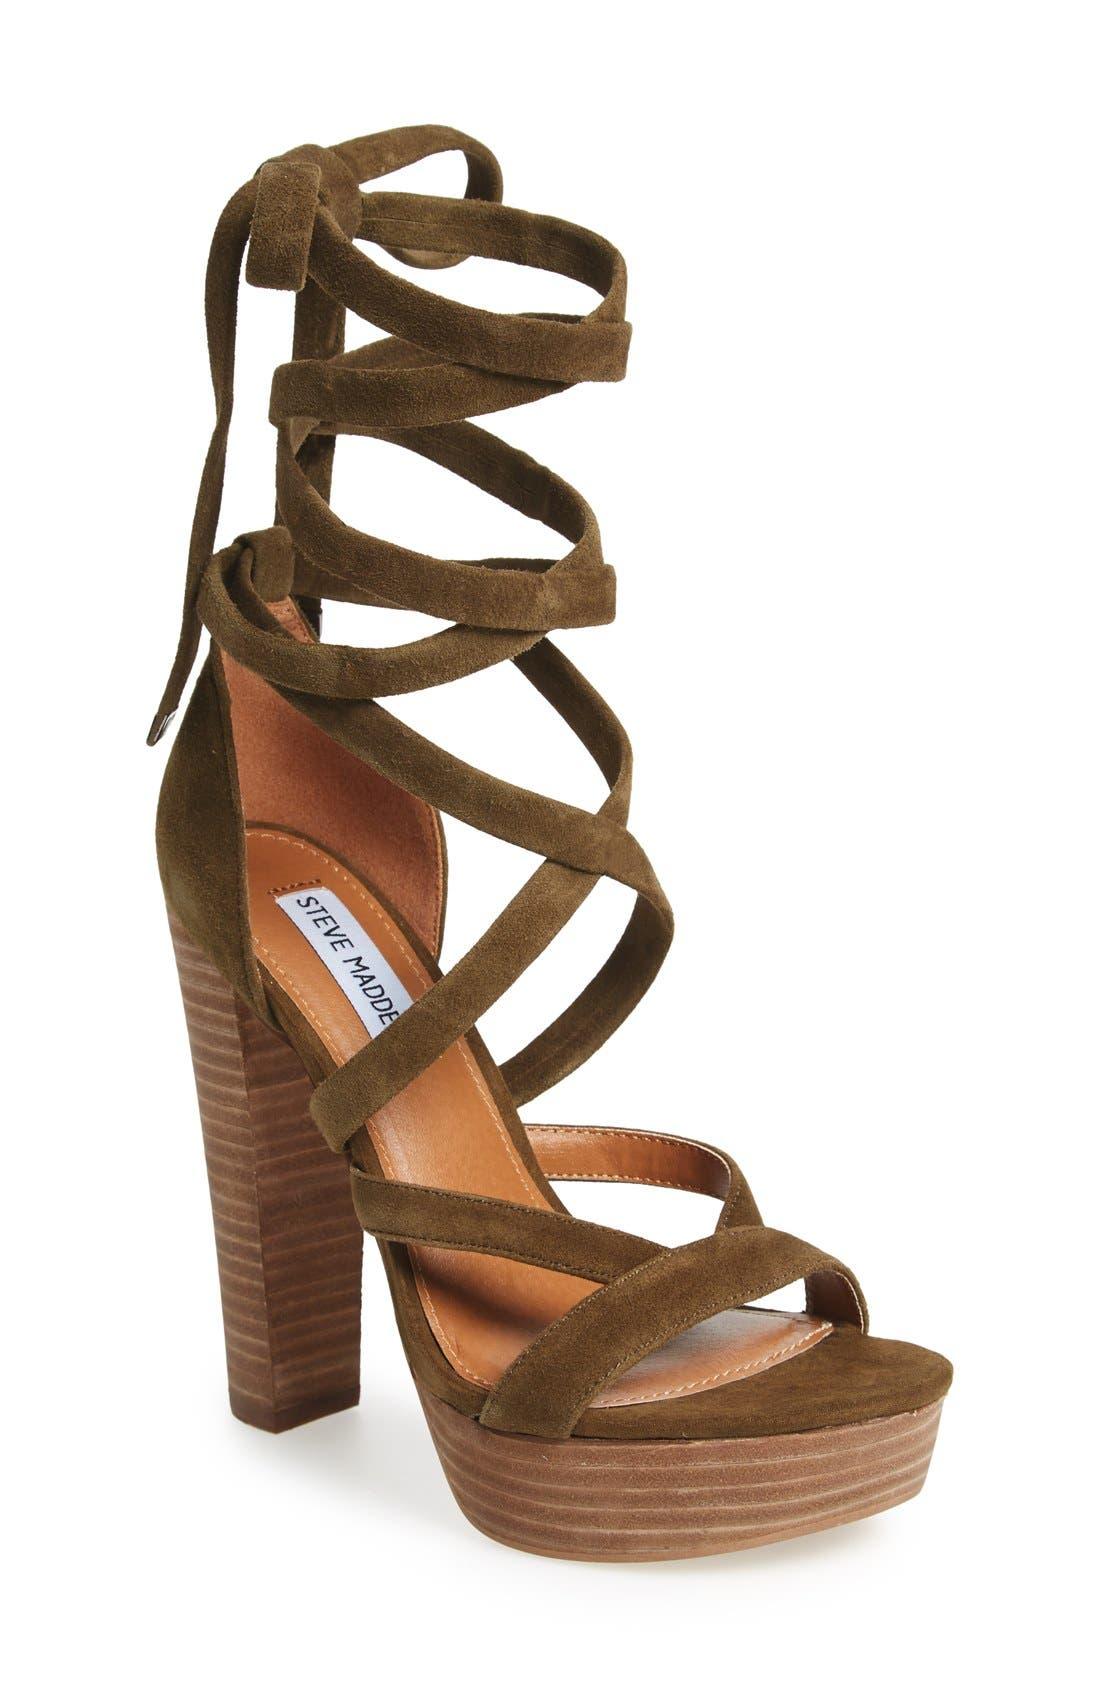 Alternate Image 1 Selected - Steve Madden 'Laceit' Platform Sandal (Women)